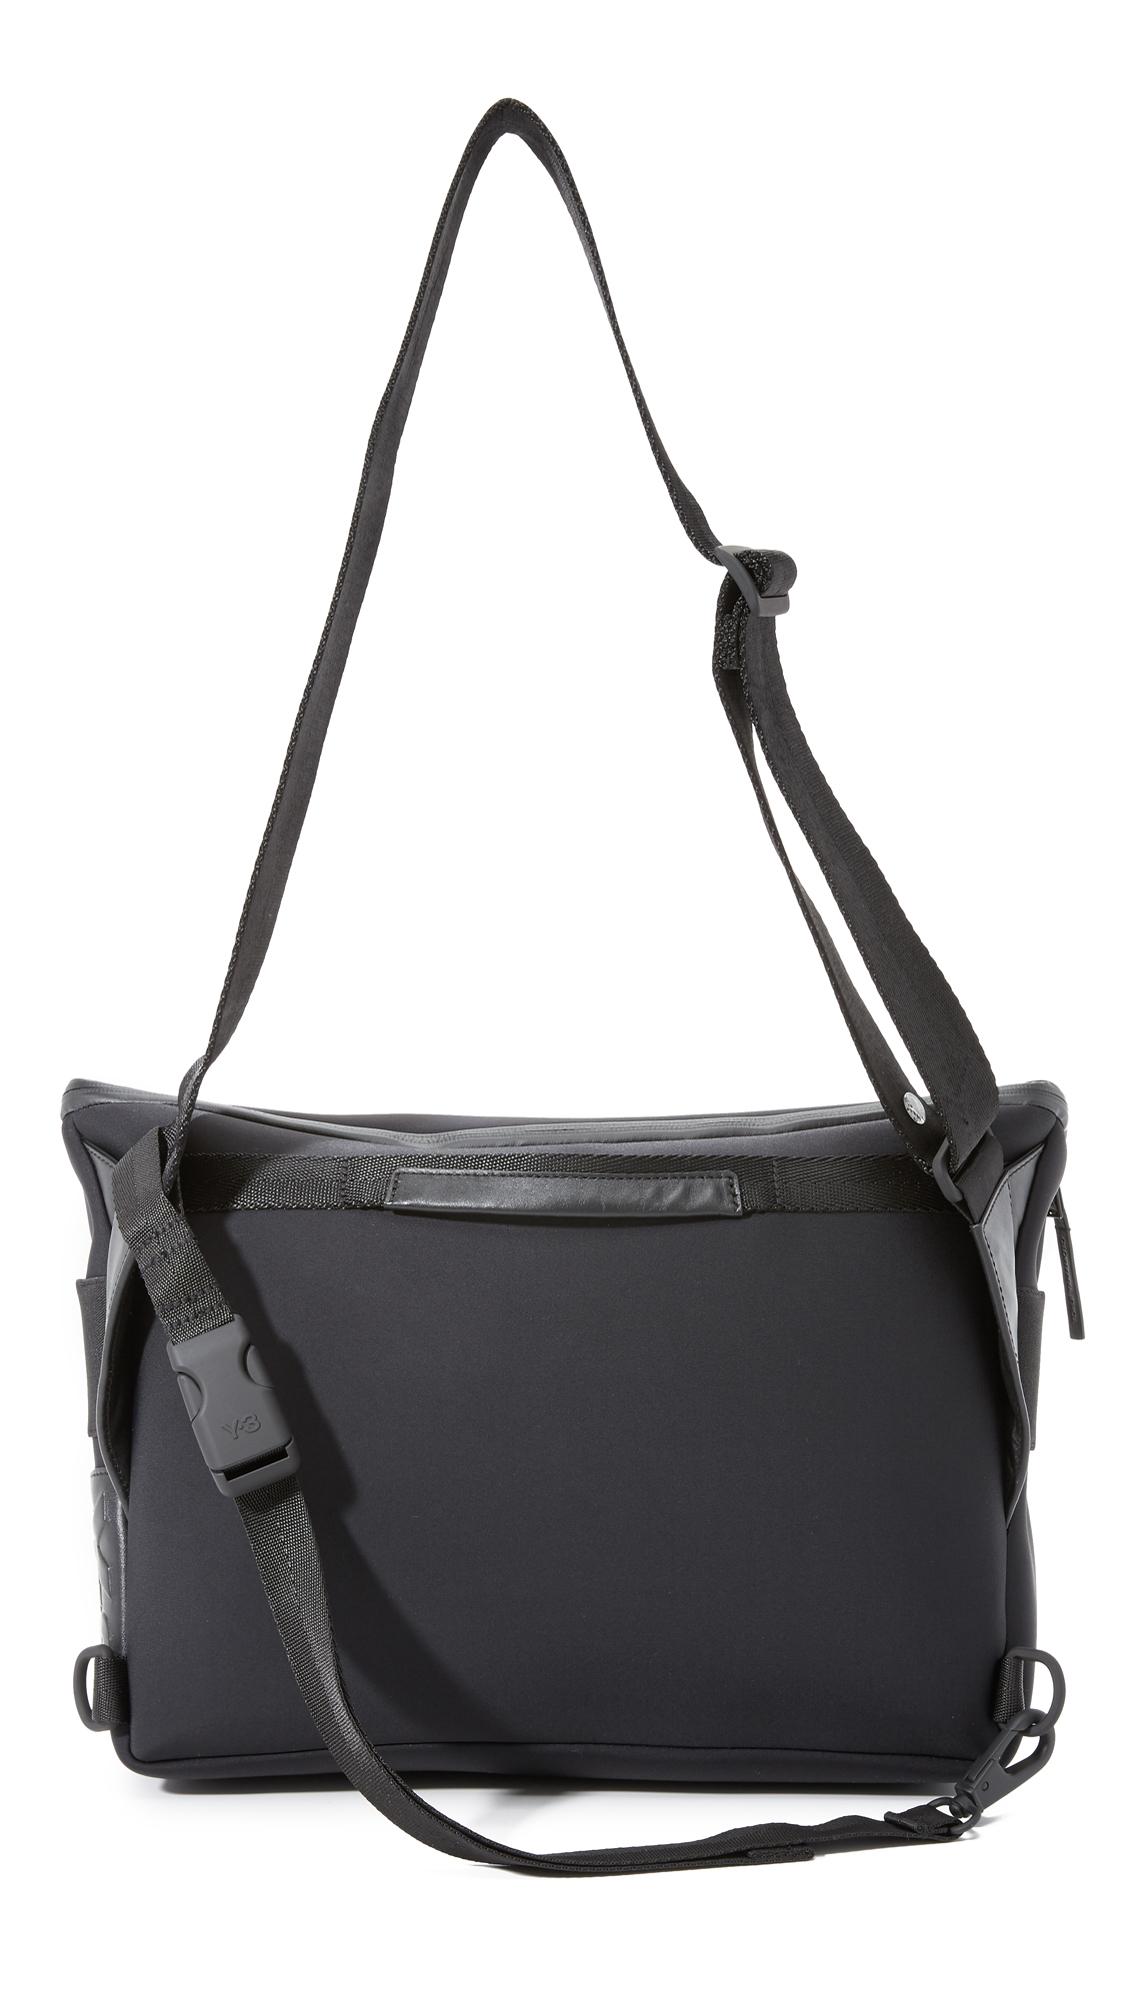 903b917c9ae Lyst - Y-3 Qasa Messenger Bag in Black for Men